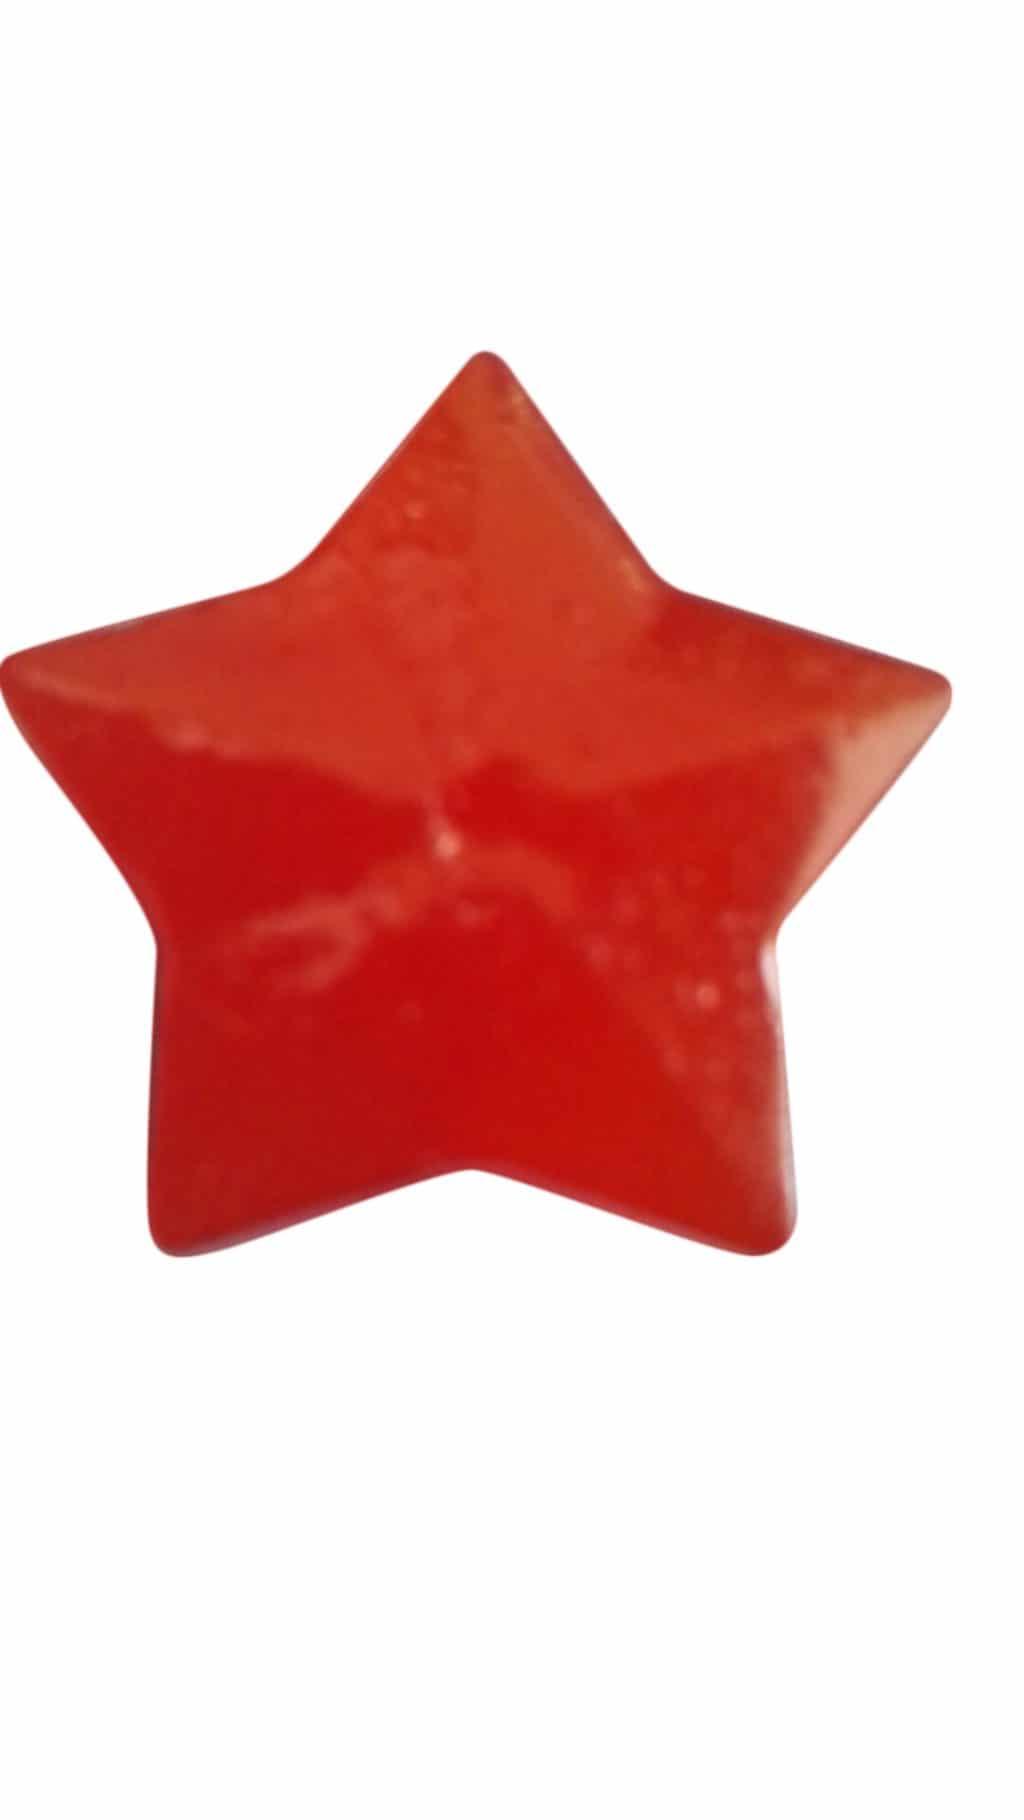 cbd-gummies, cbd-gummies-uk, cbd-sweets-uk, cbd-sweets, cbd-edibles-uk,cbd-star-gummies-cannabinoid-star-gummies-uk,star-shaped-cbd-treats-uk-sweets-star-gums